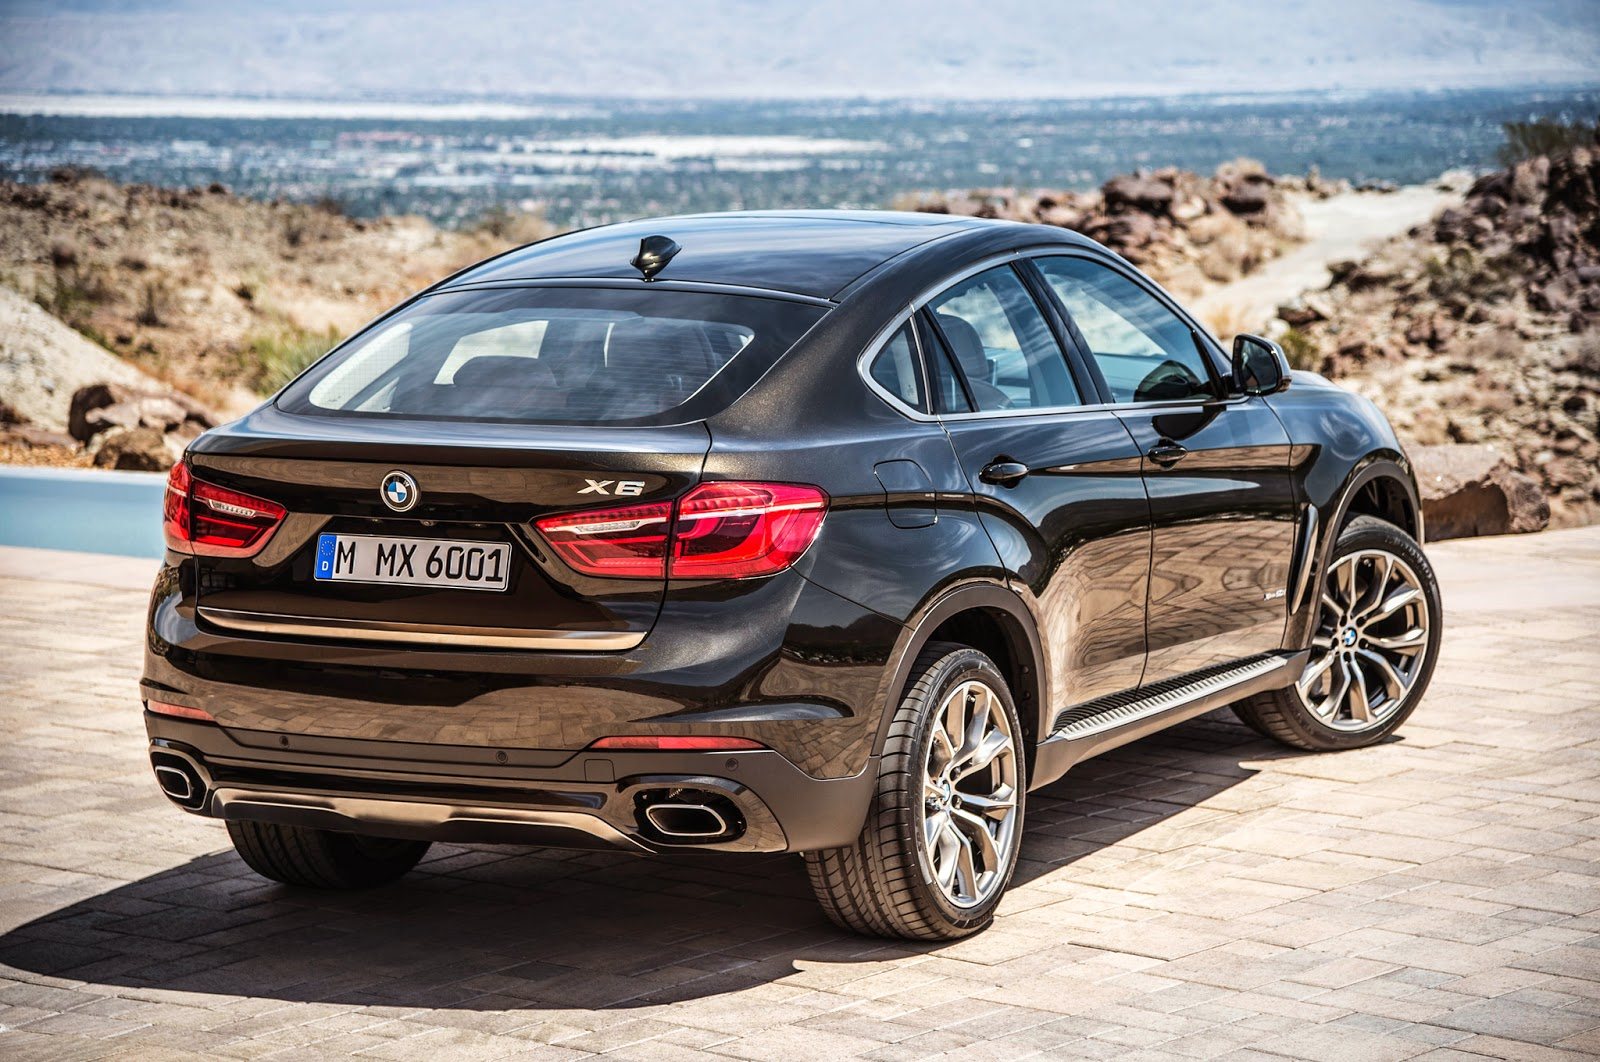 2015 BMW X6 HD Wallpaper